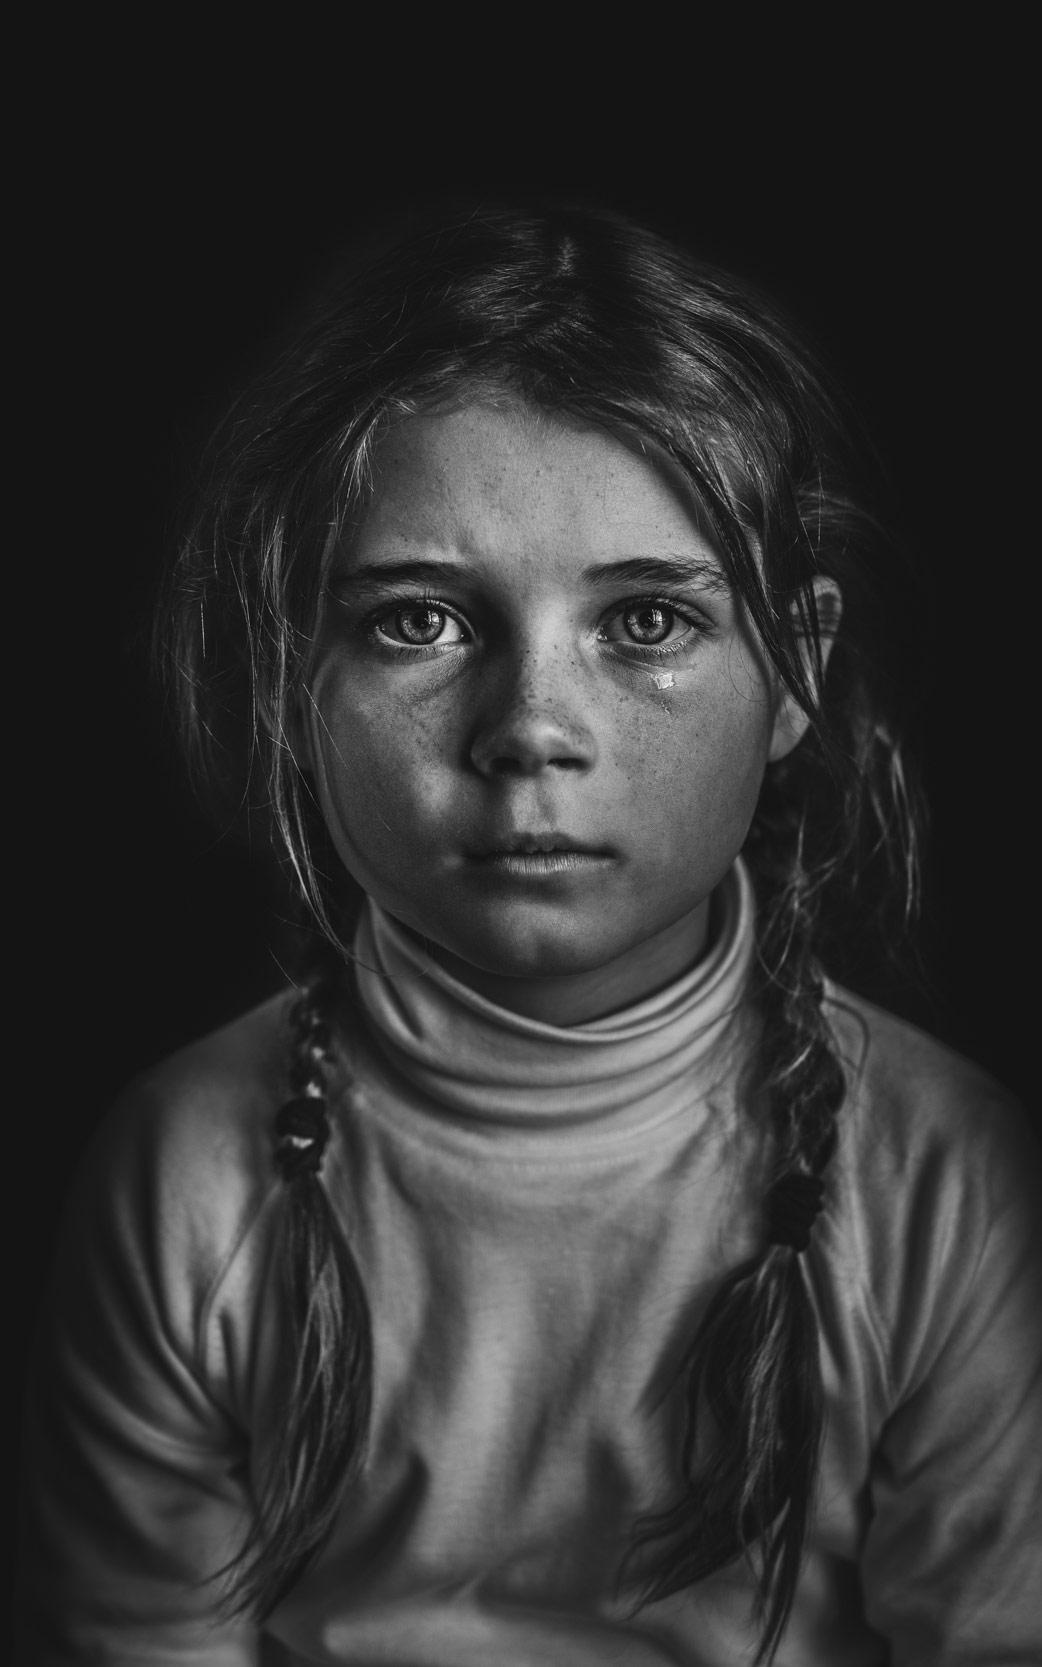 Always a Drama, © Helen Whittle, Australia, B&W Child Photo Contest